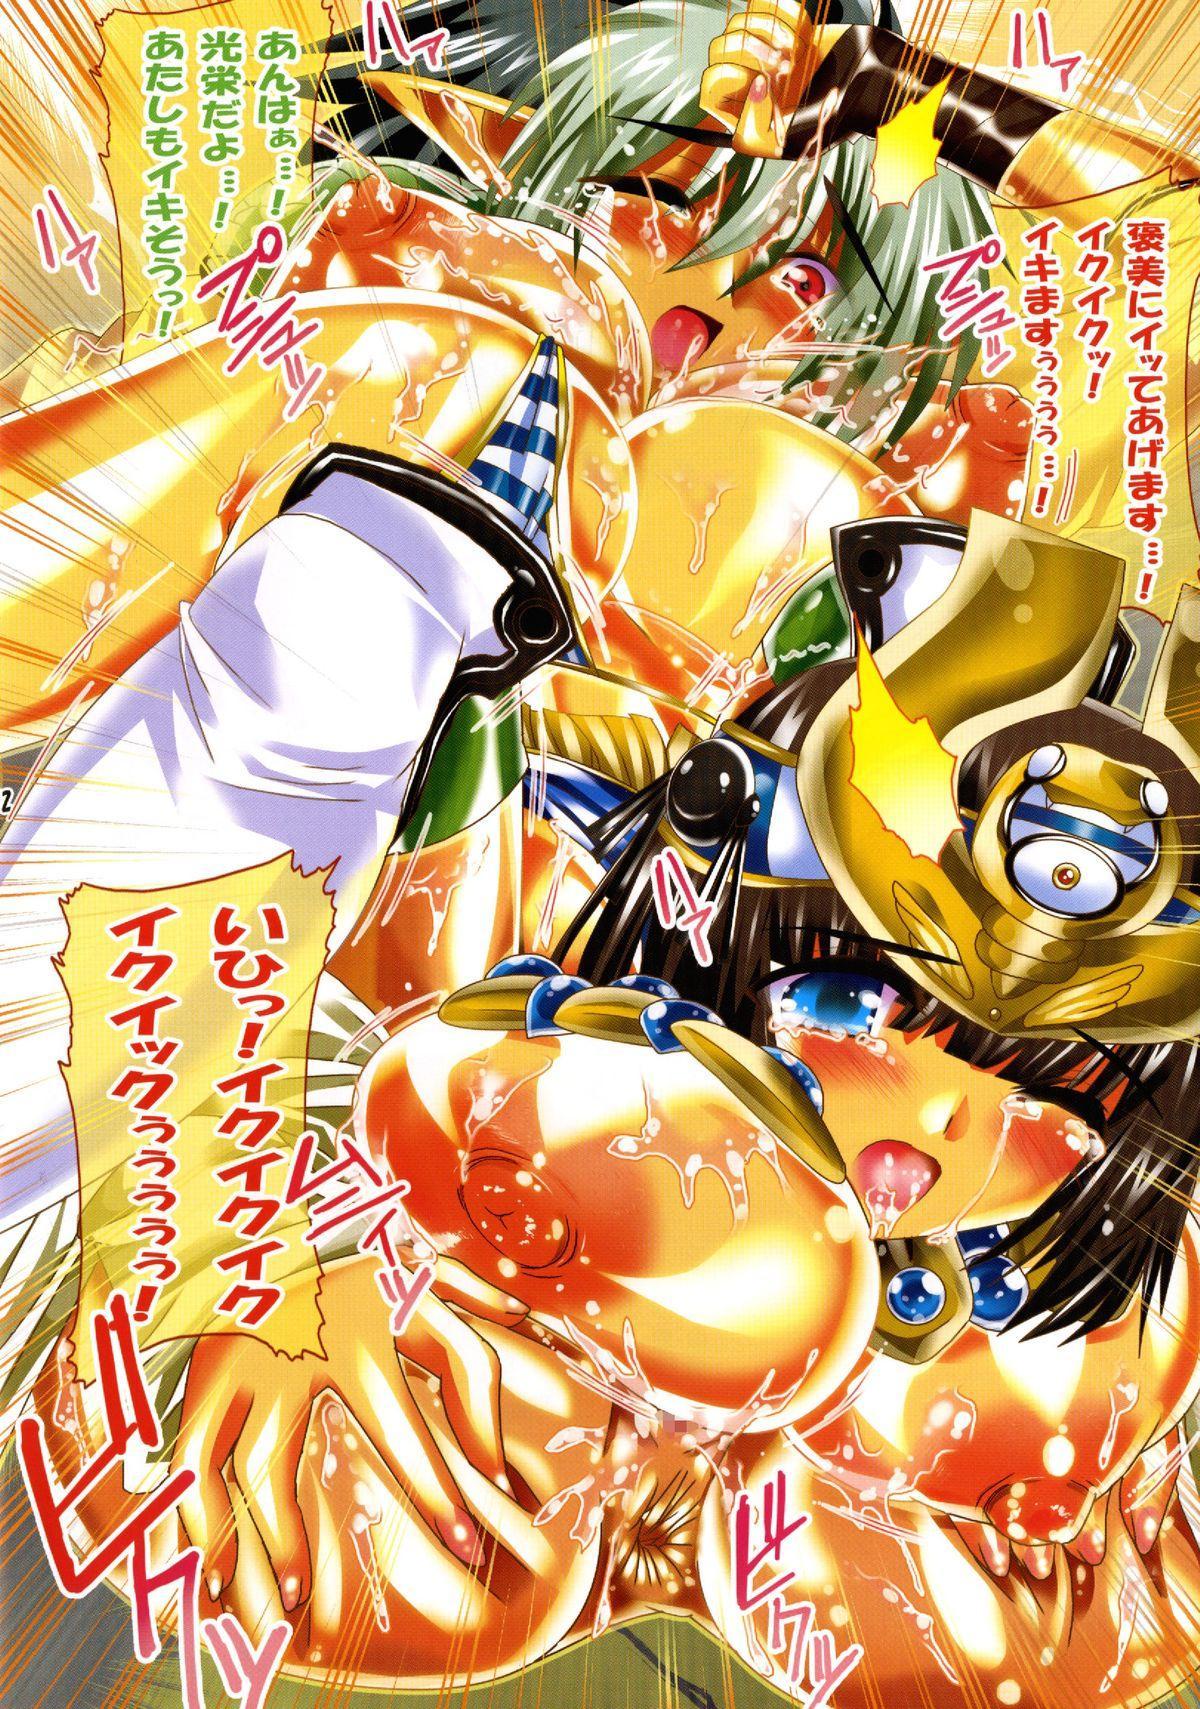 Full Color de Battle! Kiwadoi Suji no Nakami Zenbu Misechaimashita☆ 13